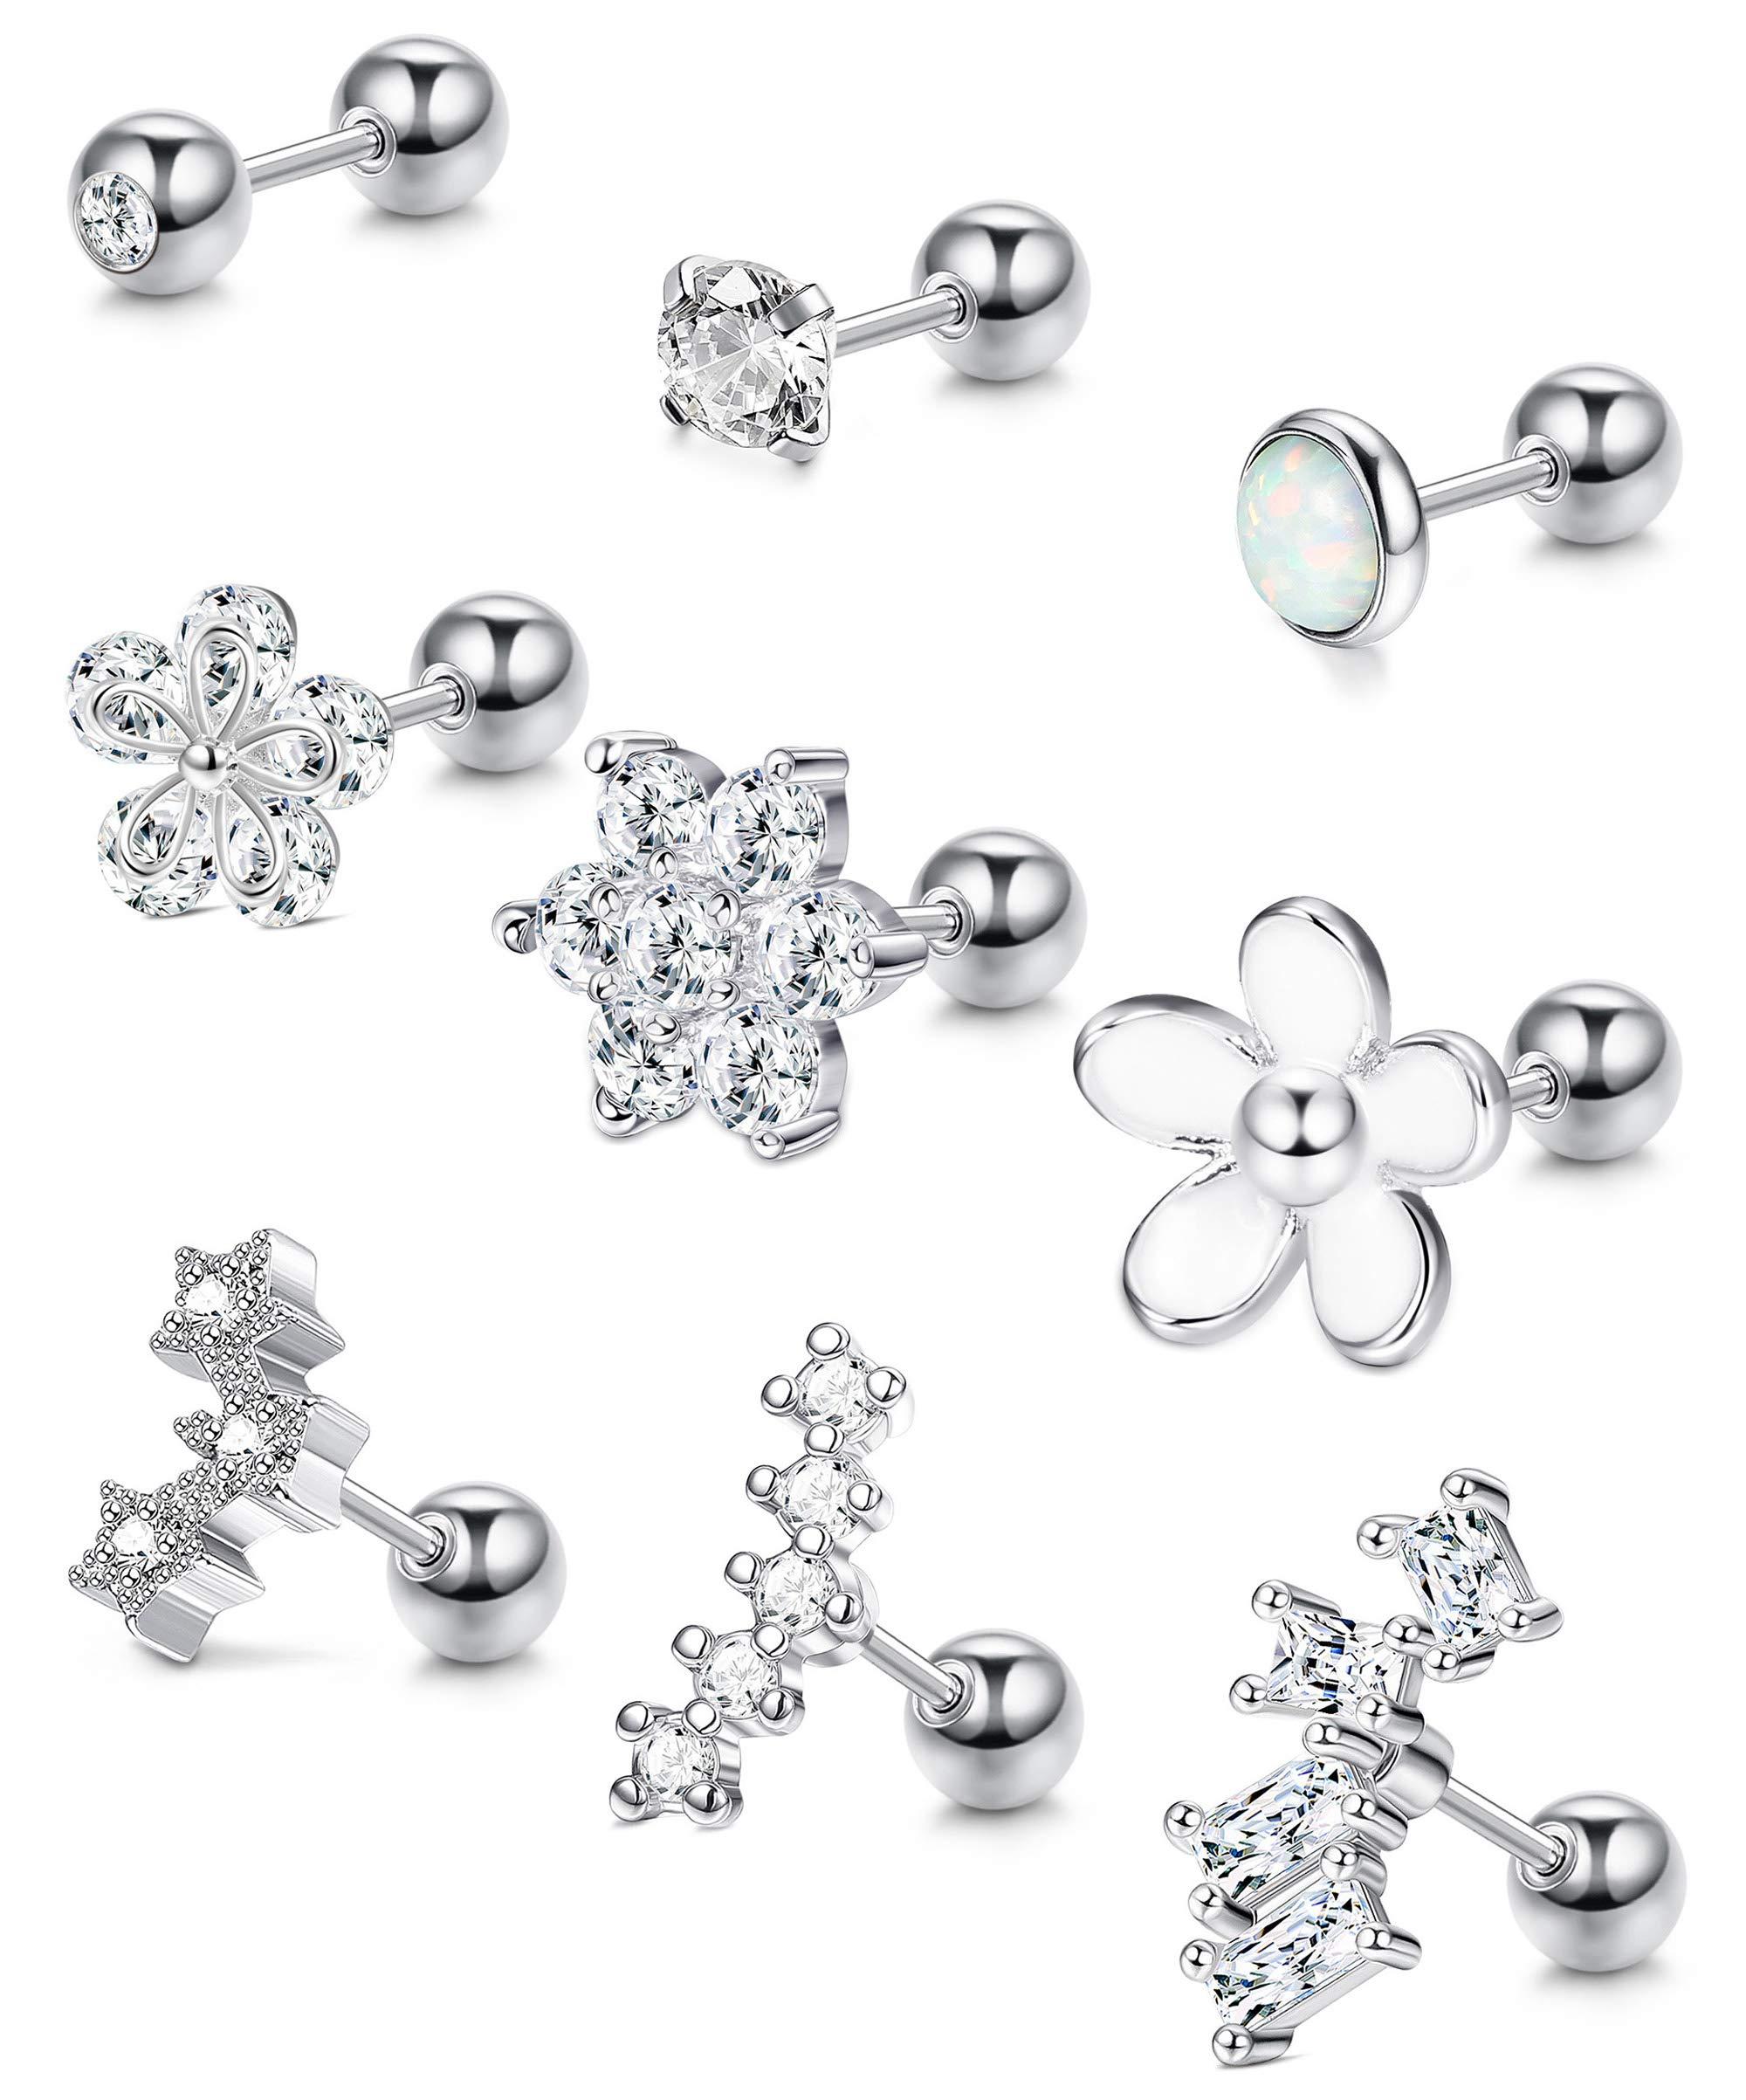 ORAZIO Cartilage Earrings for Women 16G Helix Tragus Conch Piercings Jewelry Stud by ORAZIO